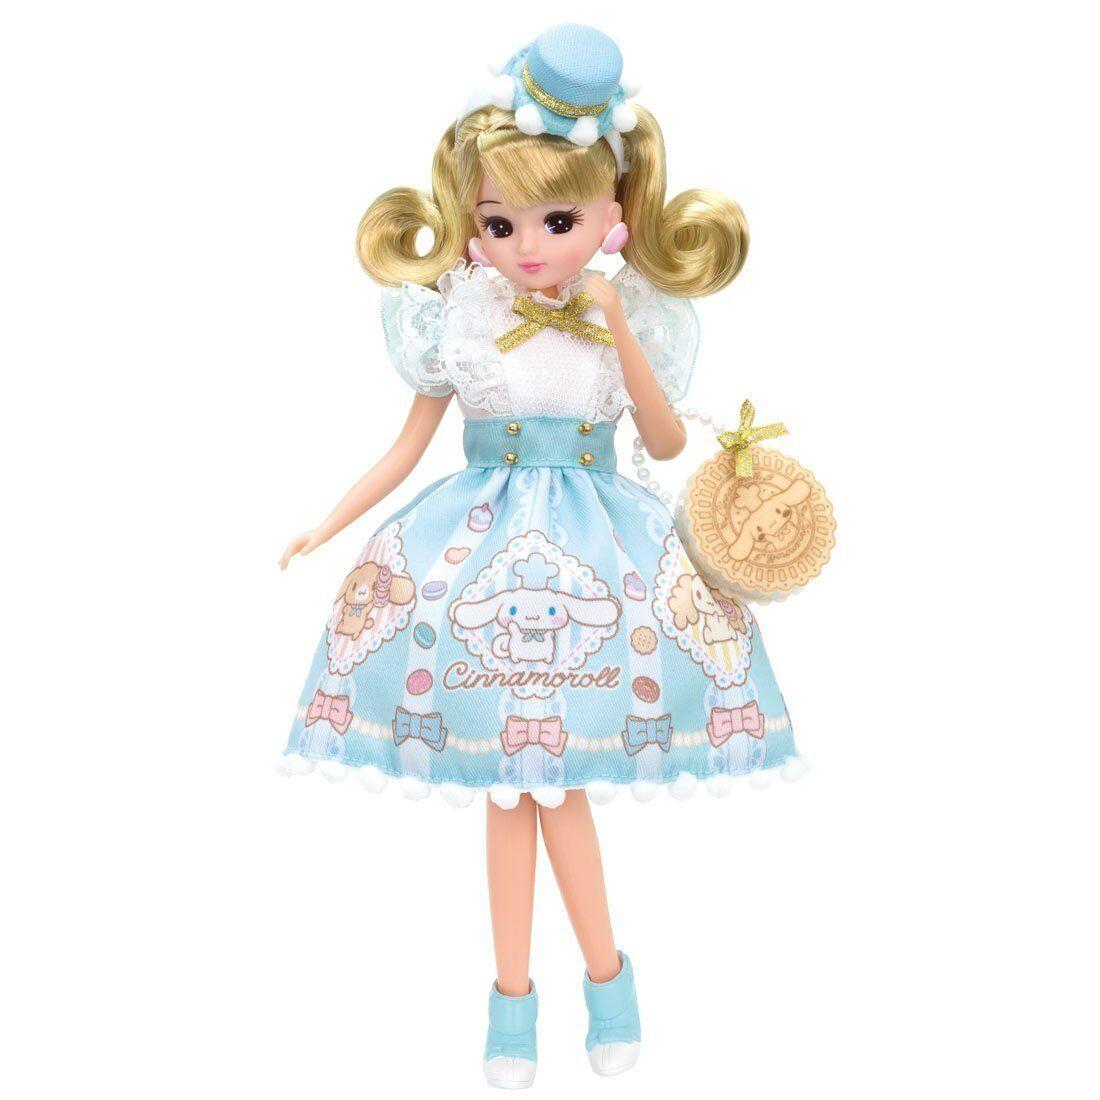 TAKARA TAKARA TAKARA TOMY Licca Doll LD-13 CinnamGoldll Japan 0fcabf